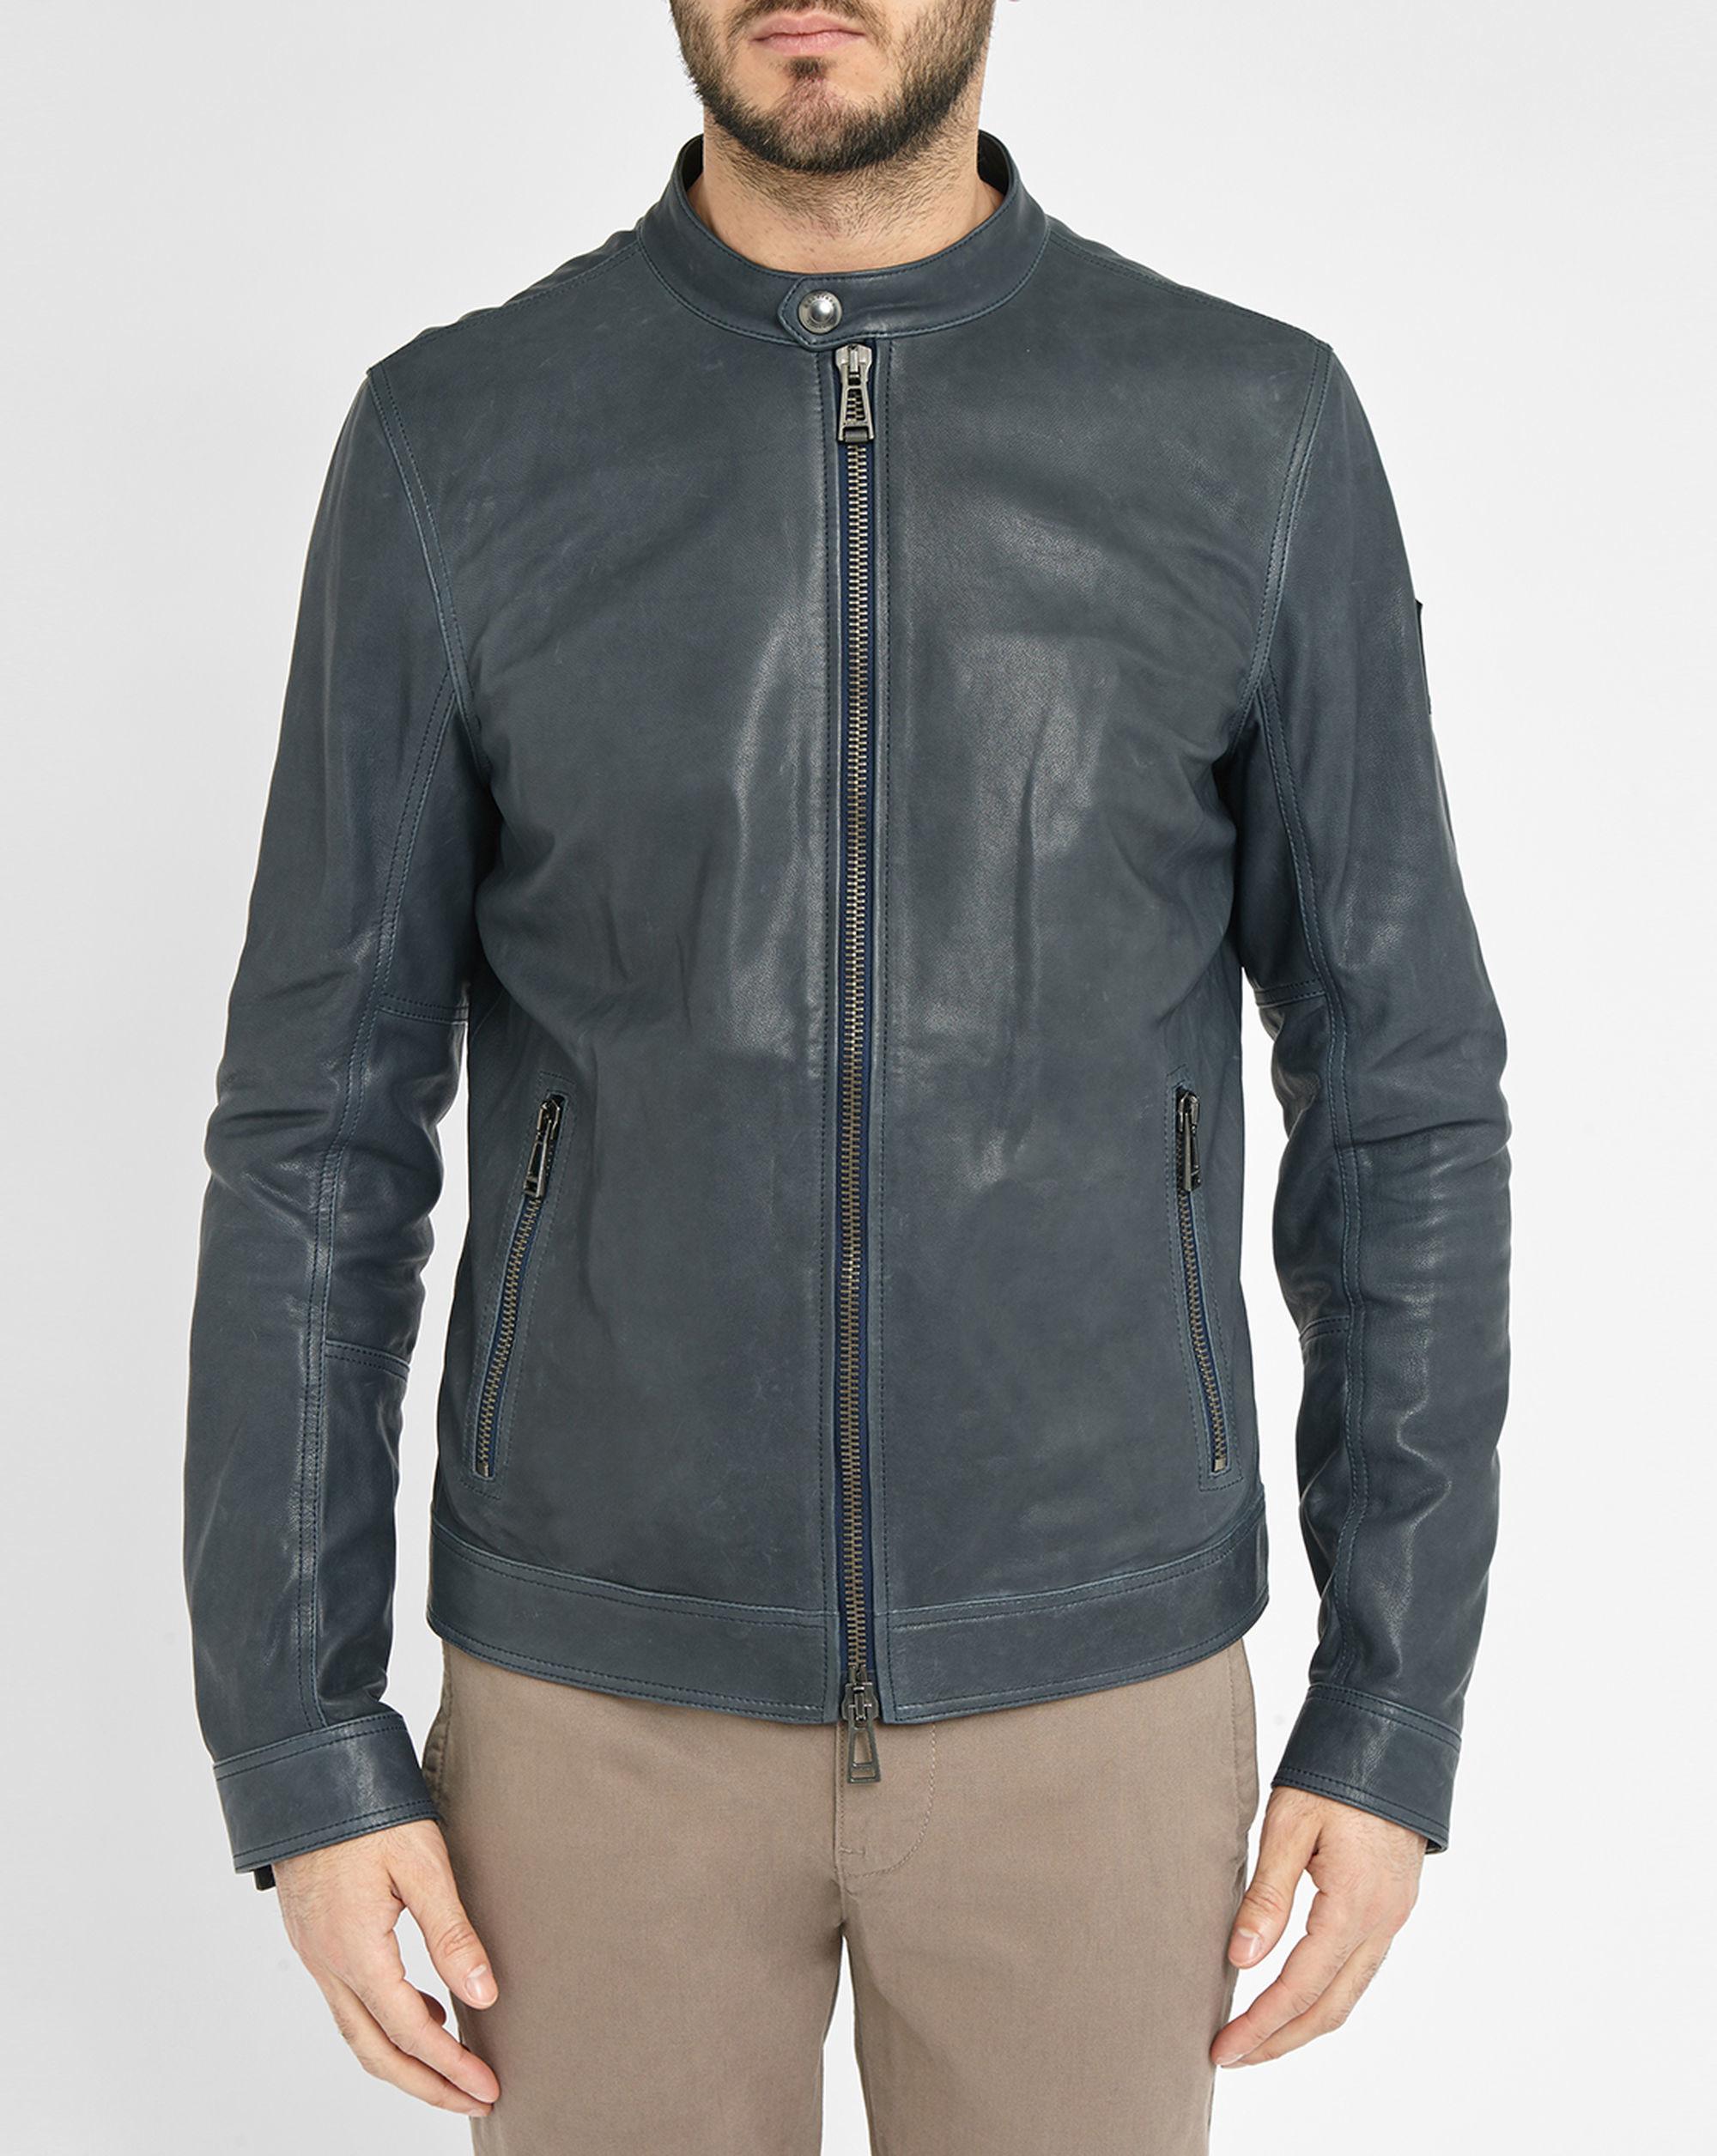 Leather jacket cape town - Leather Jacket Cape Town 7